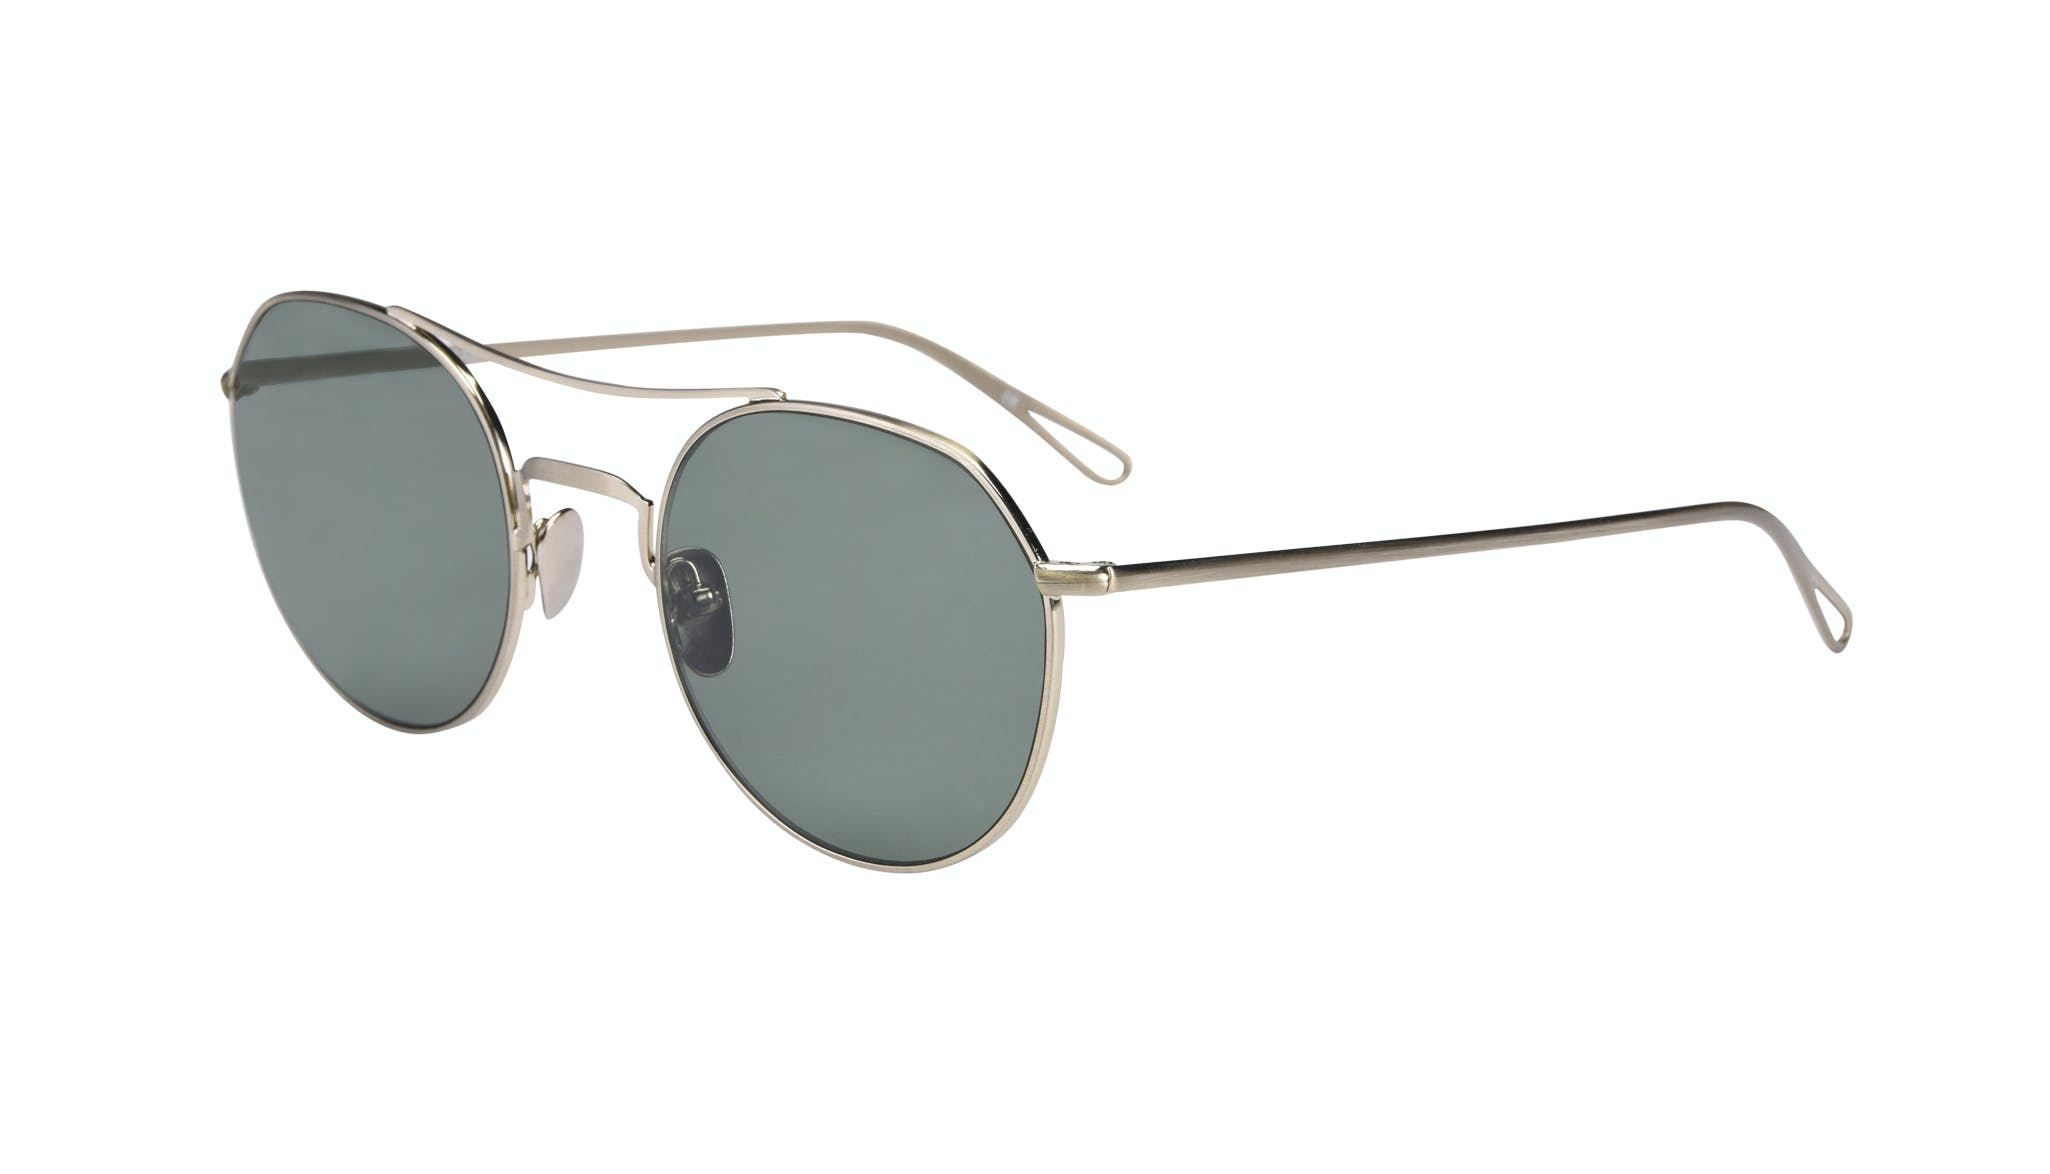 Affordable Fashion Glasses Aviator Sunglasses Men Force Brass  Tilt